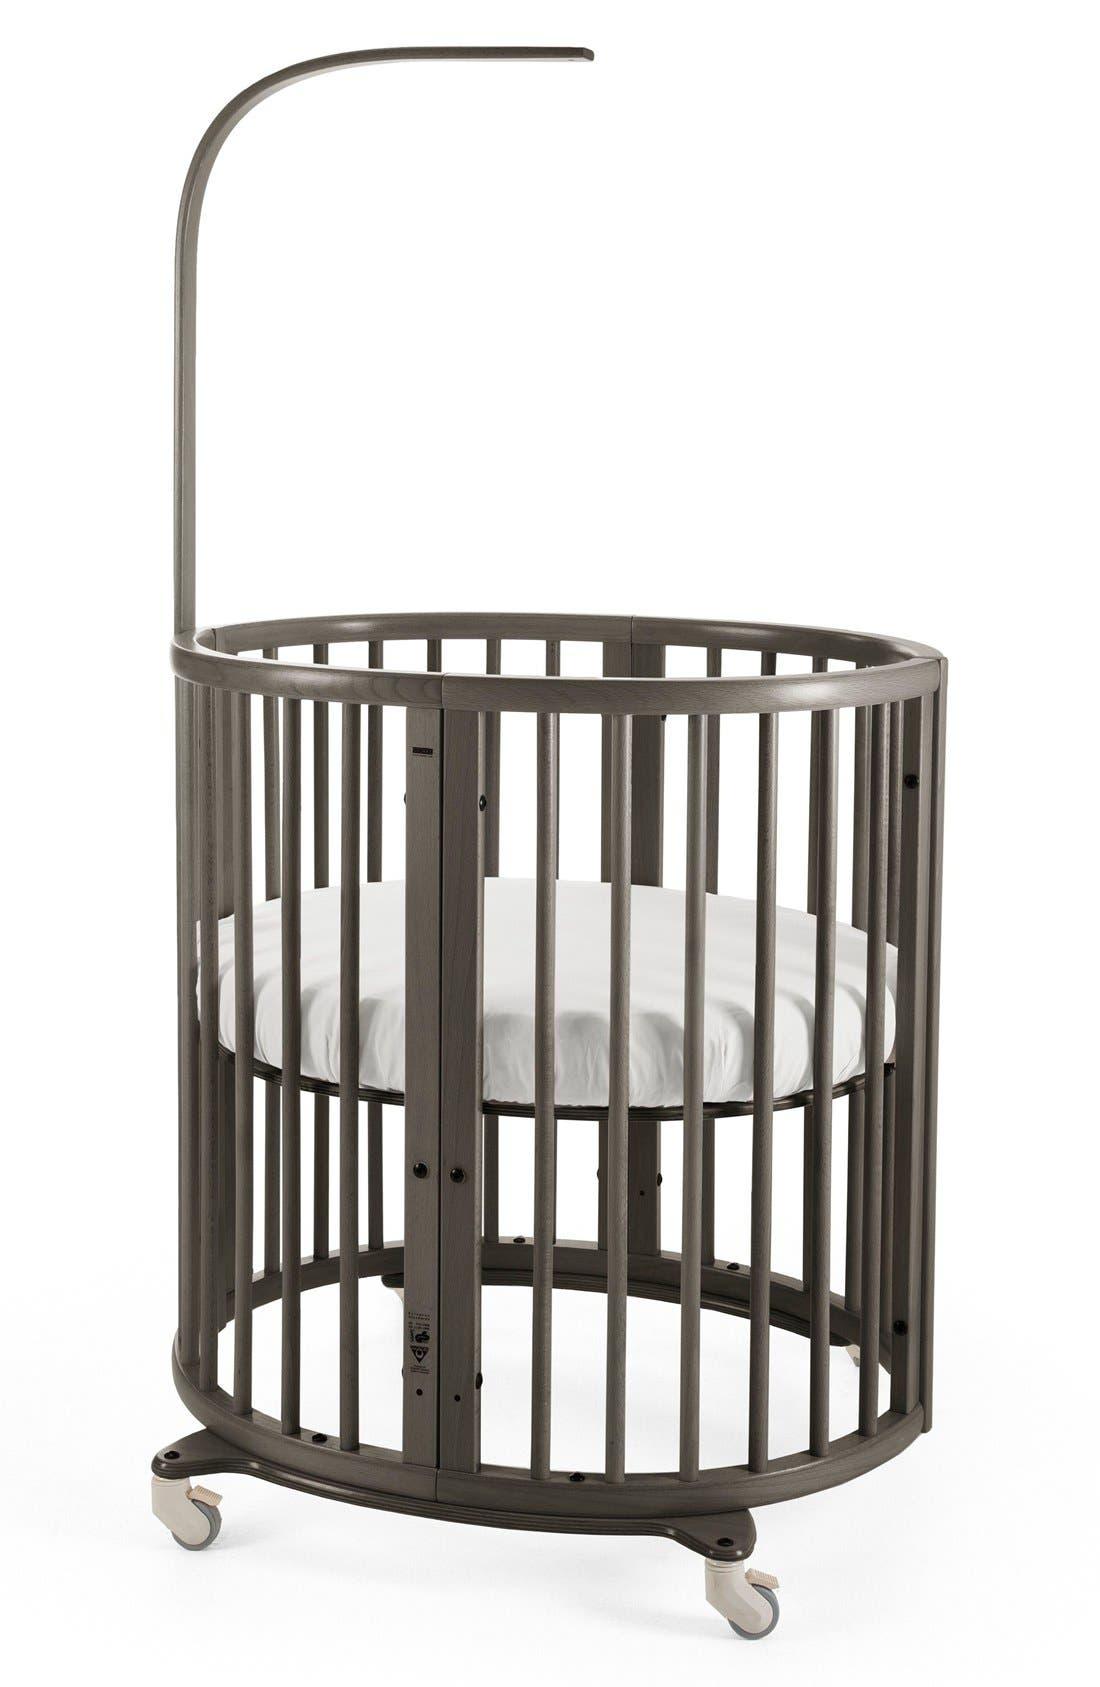 Alternate Image 1 Selected - Stokke Sleepi Mini Crib, Drape Rod & Mattress Bundle